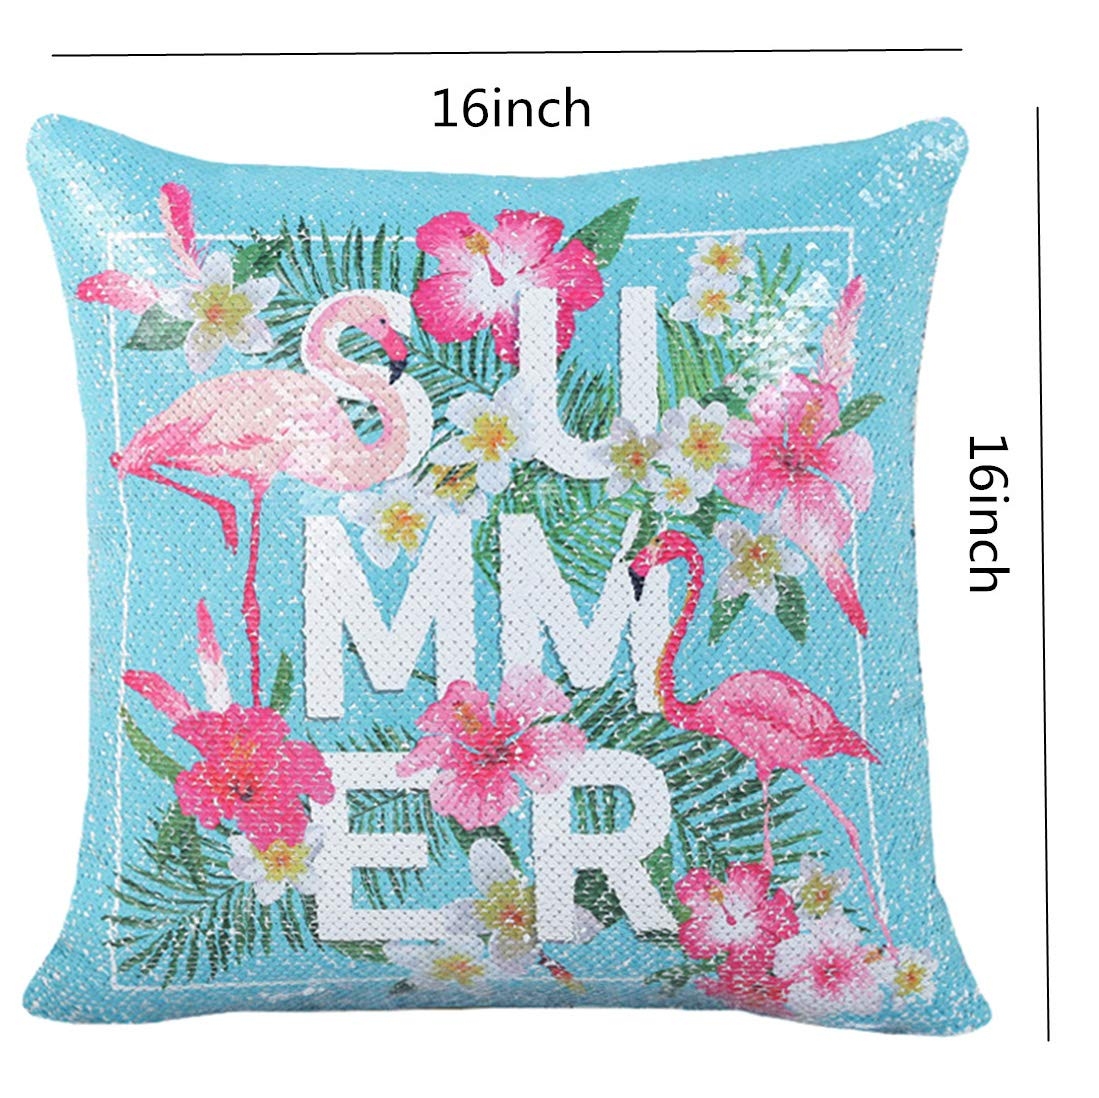 ROOSSI Mermaid Sequin Flamingos Decorative Pillow Cover 16inch Square Bling Cushion Cover Home Sofa Car Pillowcase Blue 2